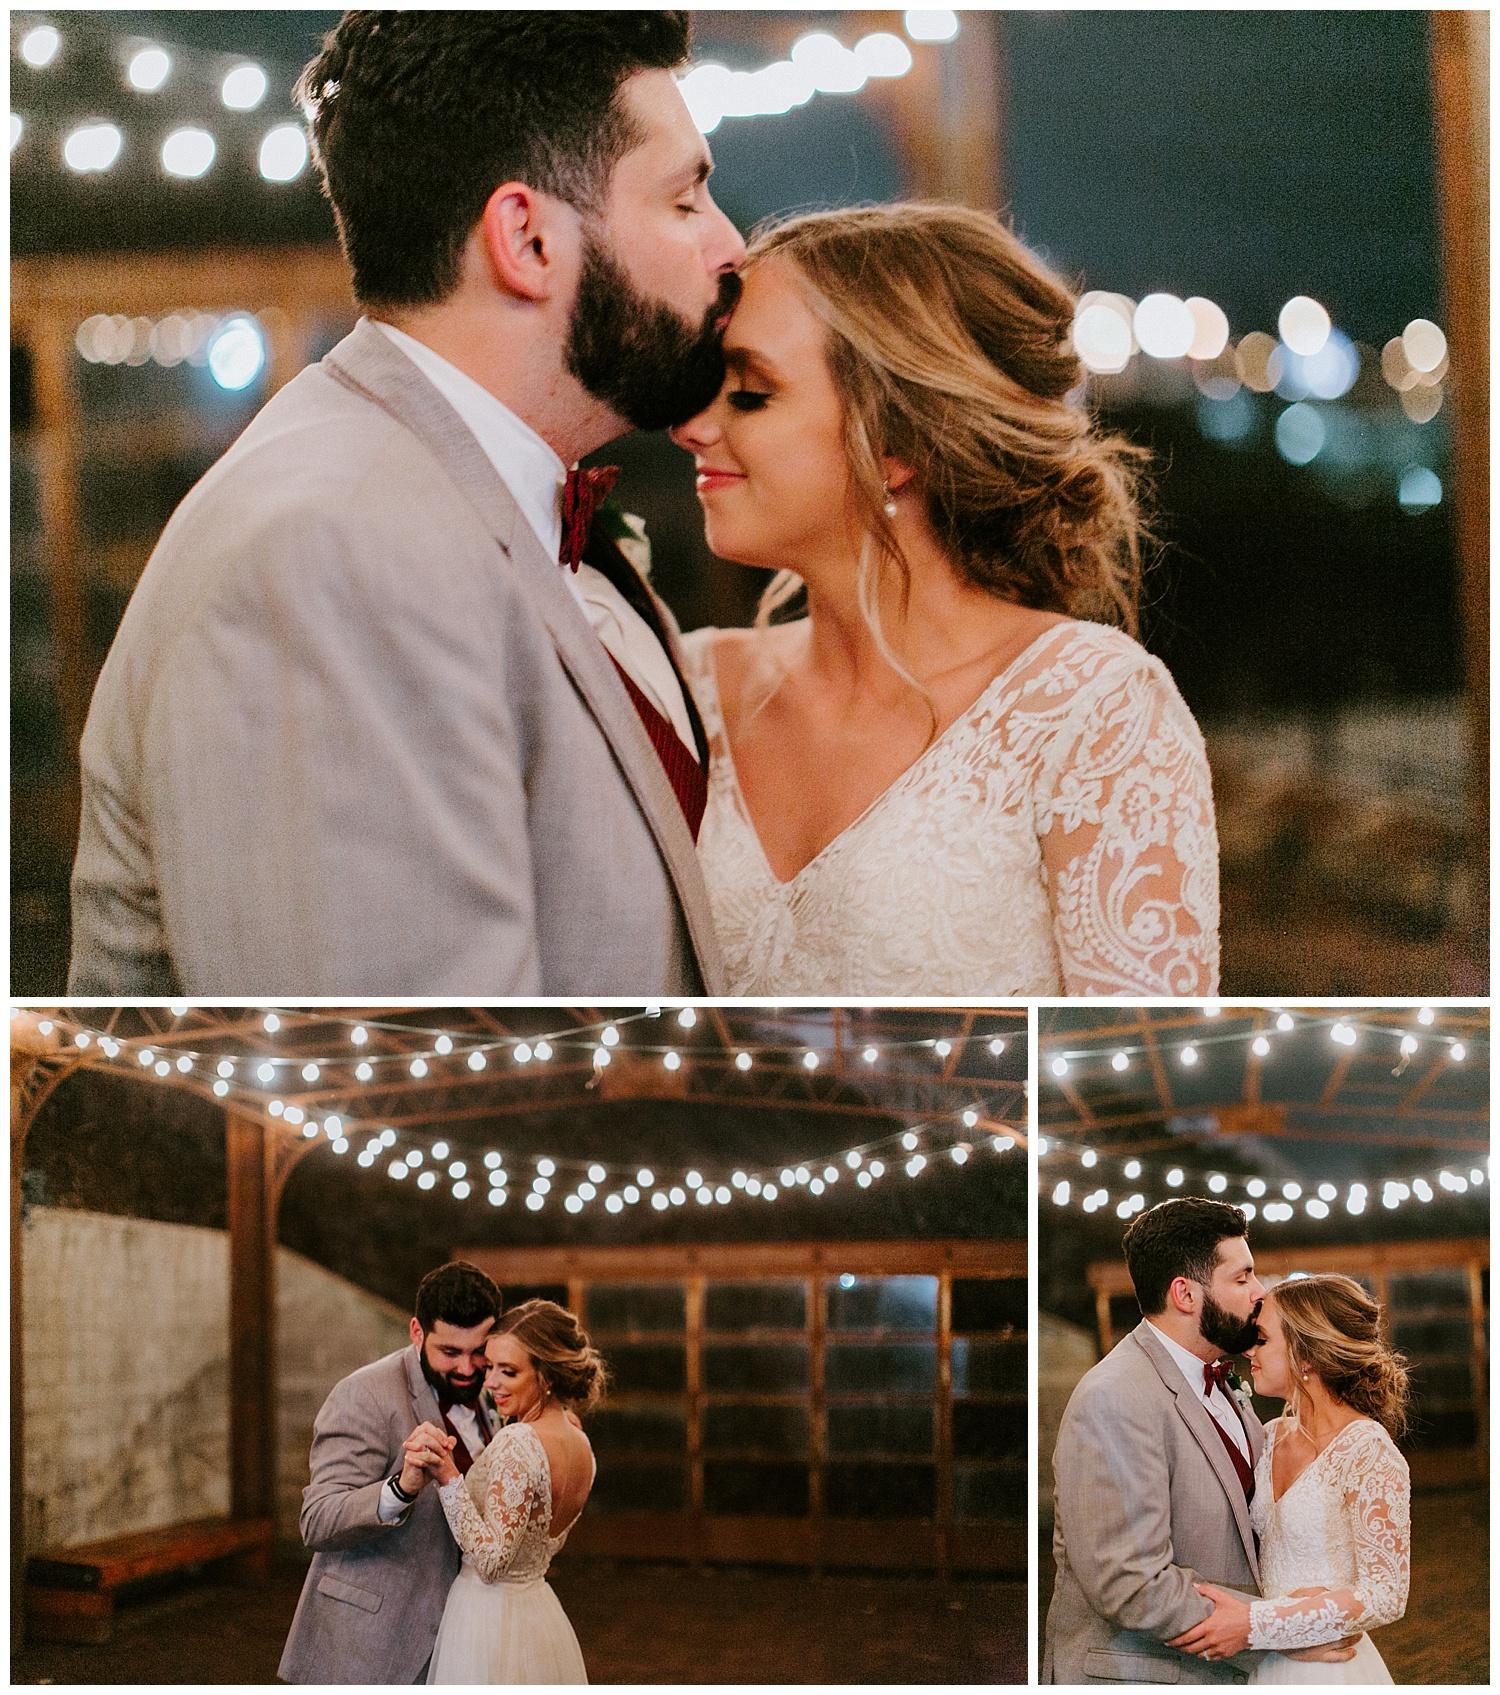 winter-wedding-the standard-knoxville_2019-01-23_0087.jpg